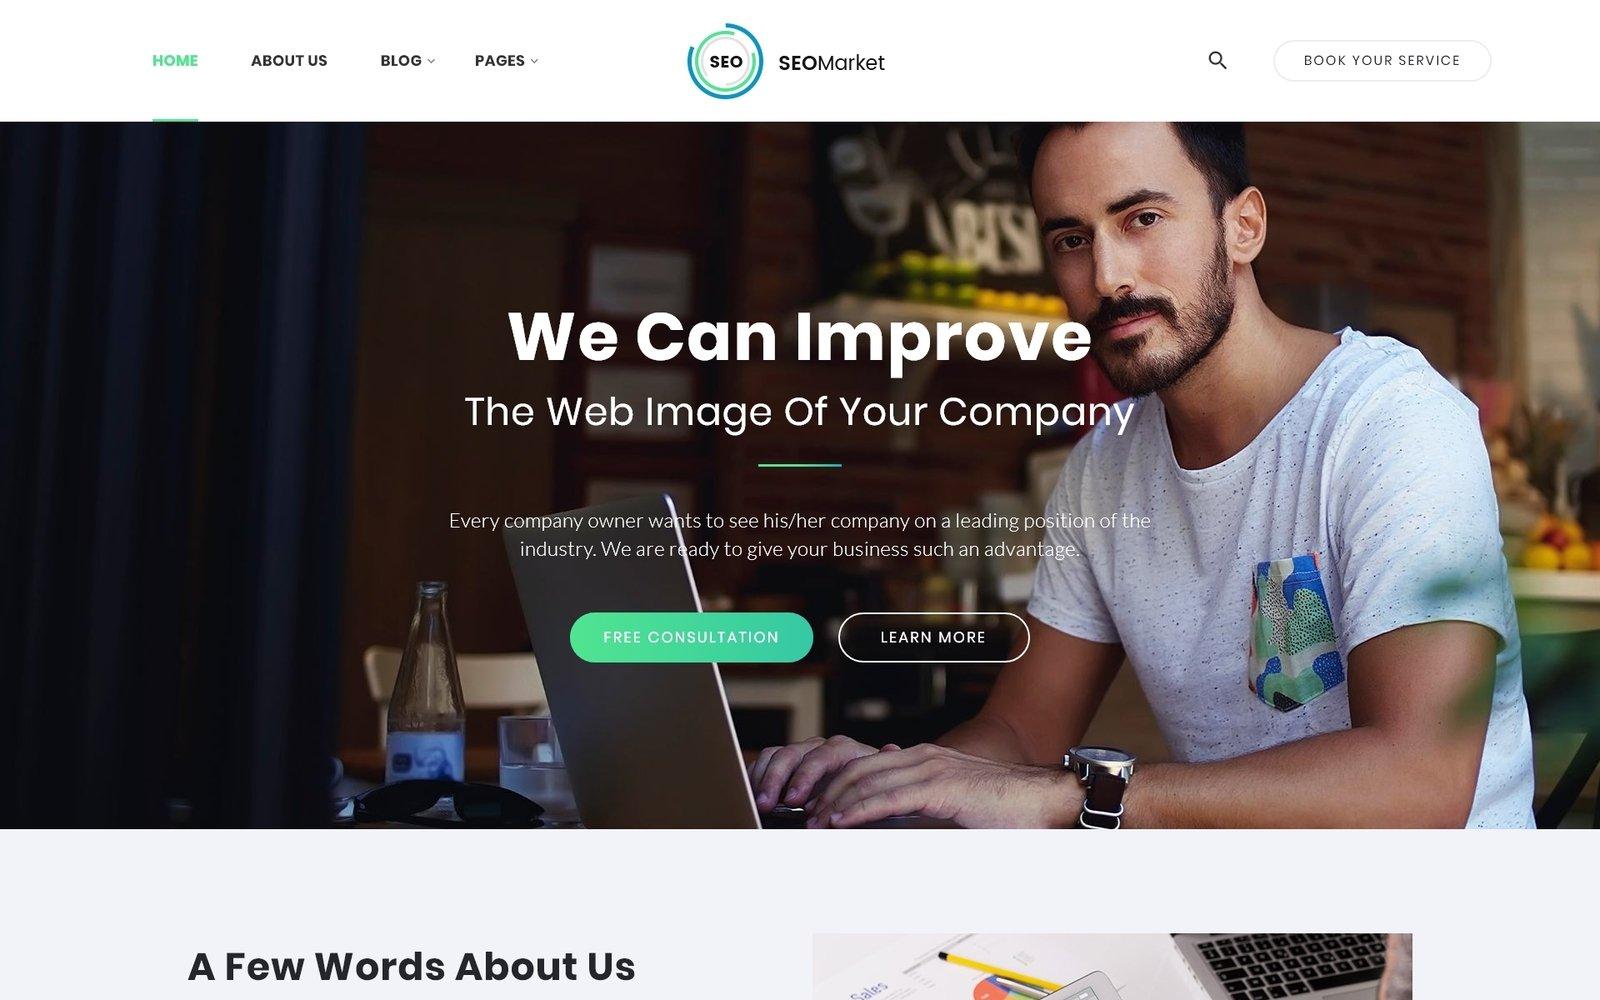 SEOMarket - SEO & Marketing Agency Website Template - screenshot